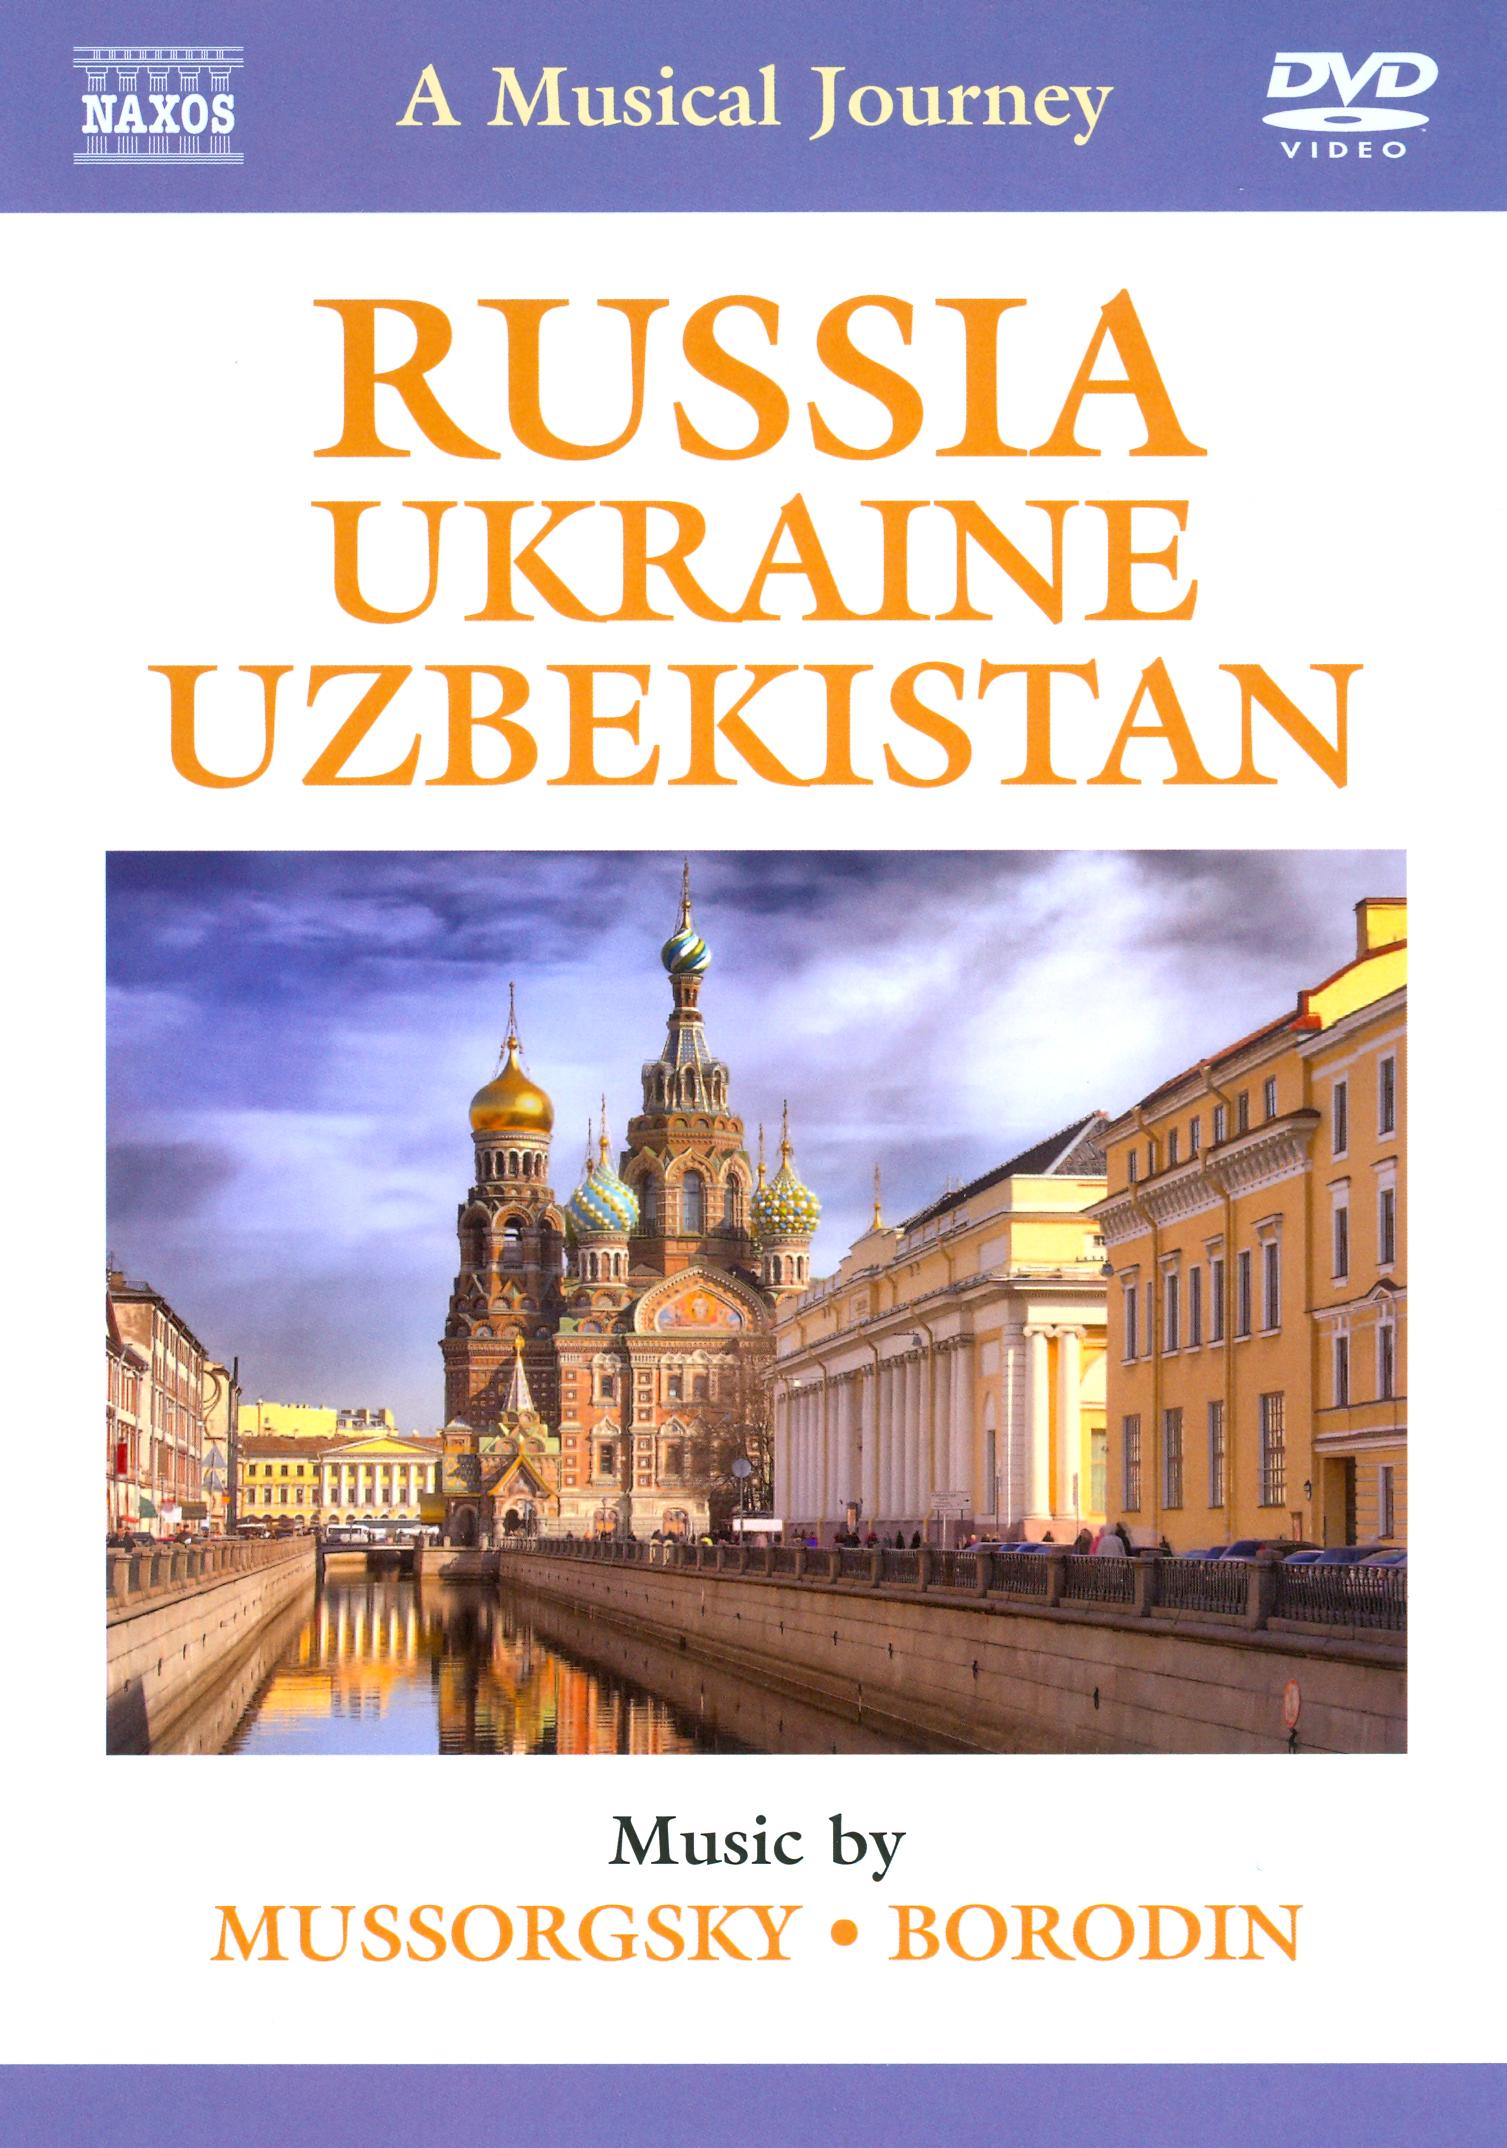 A Musical Journey: Russia/Ukraine/Uzbekistan - Mussorgsky/Borodin